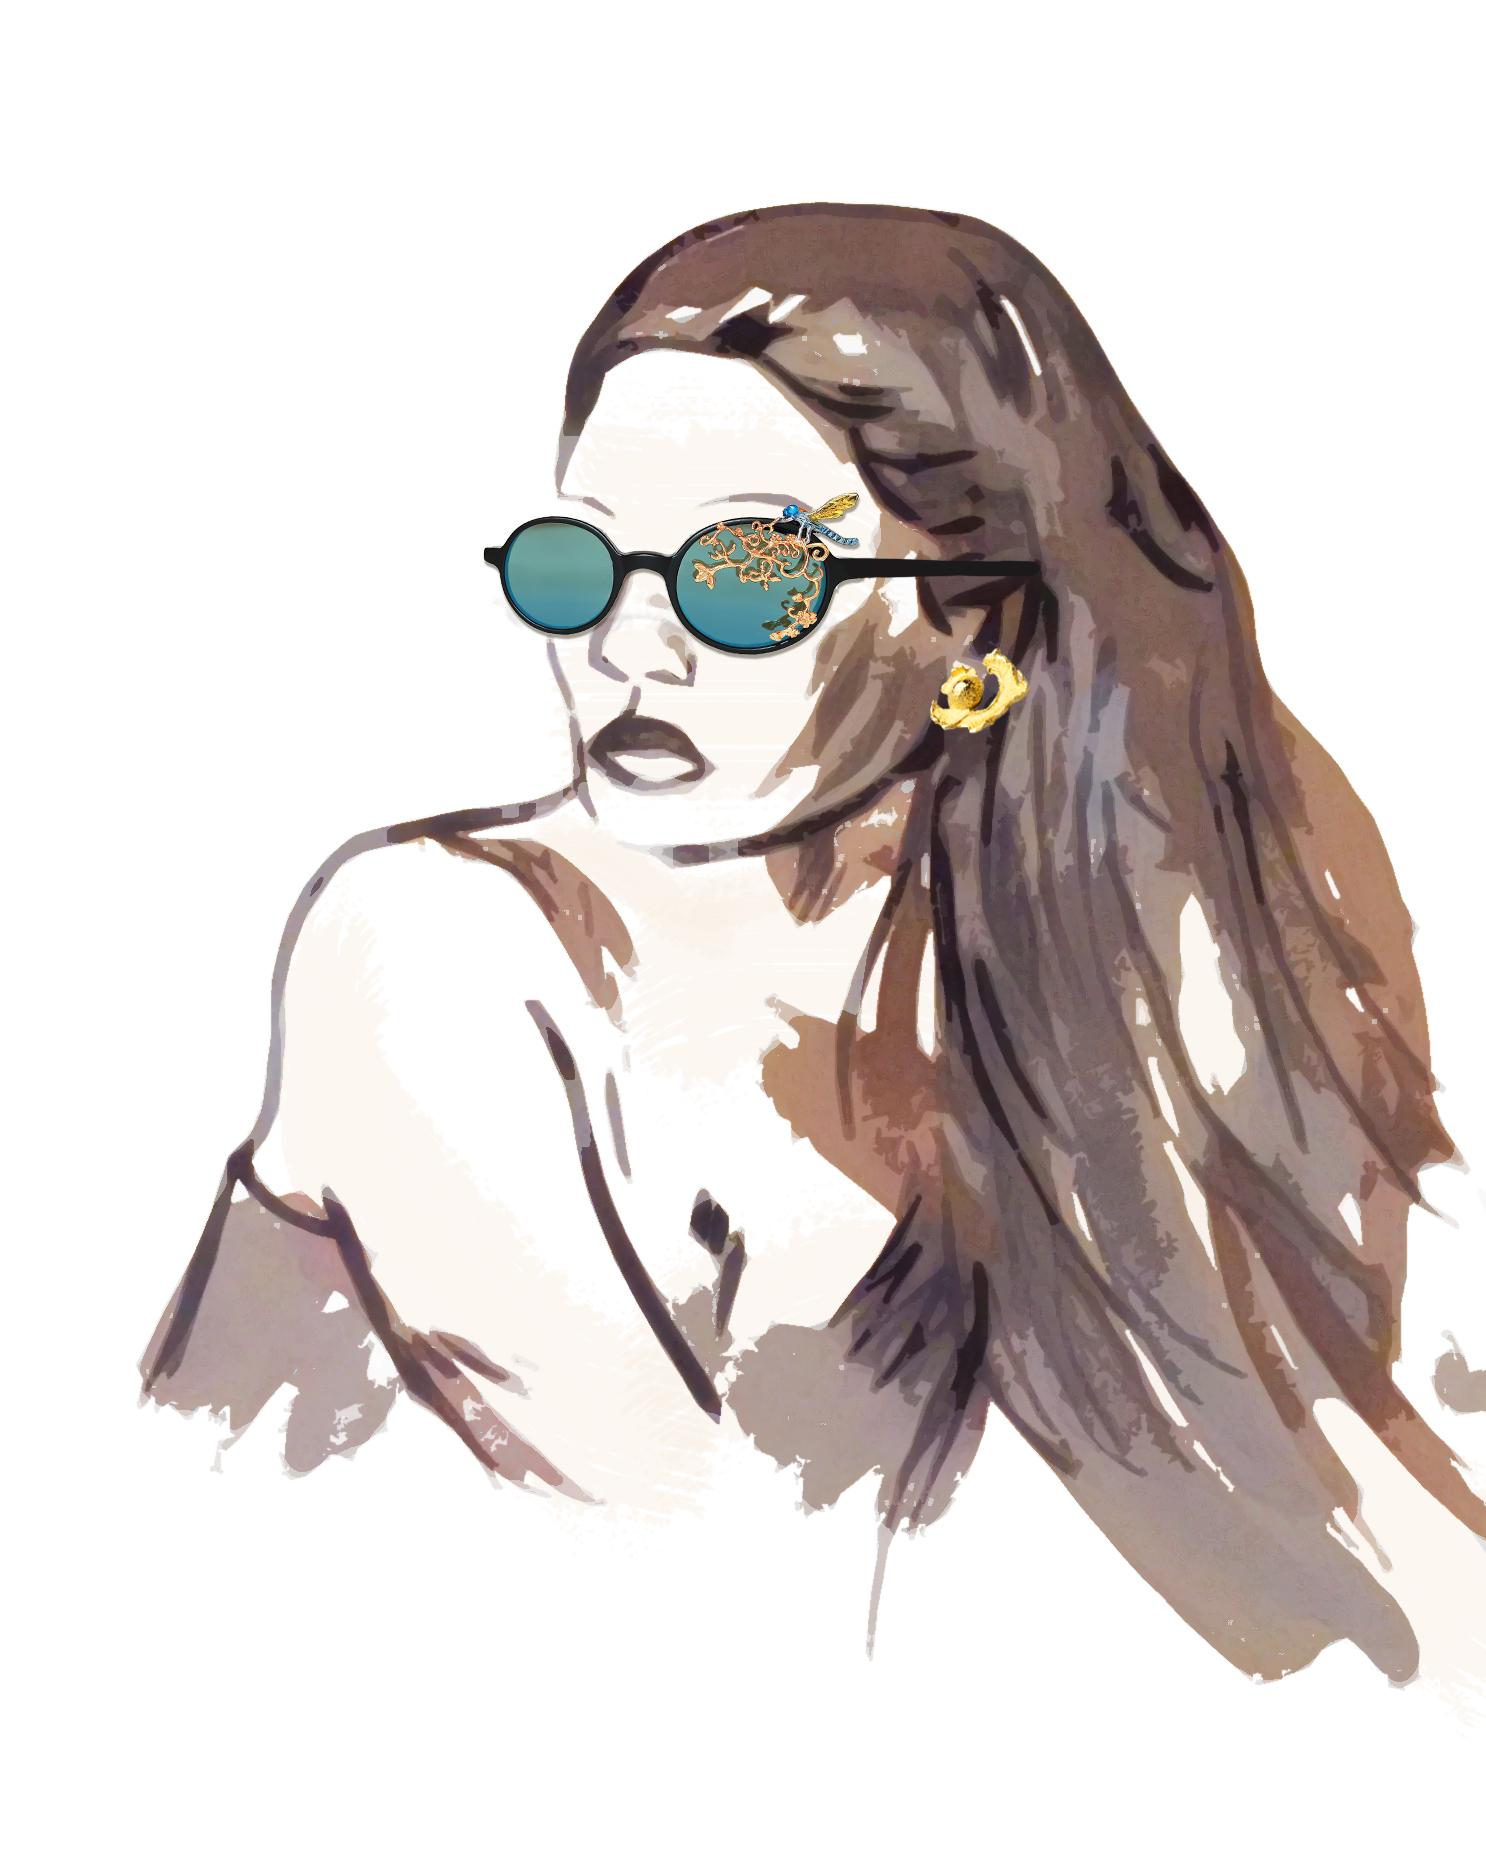 19- Avish Khebrezadeh Maskhara with Dragonfly sunglasses; Kendell Geers Within Earshot earrings